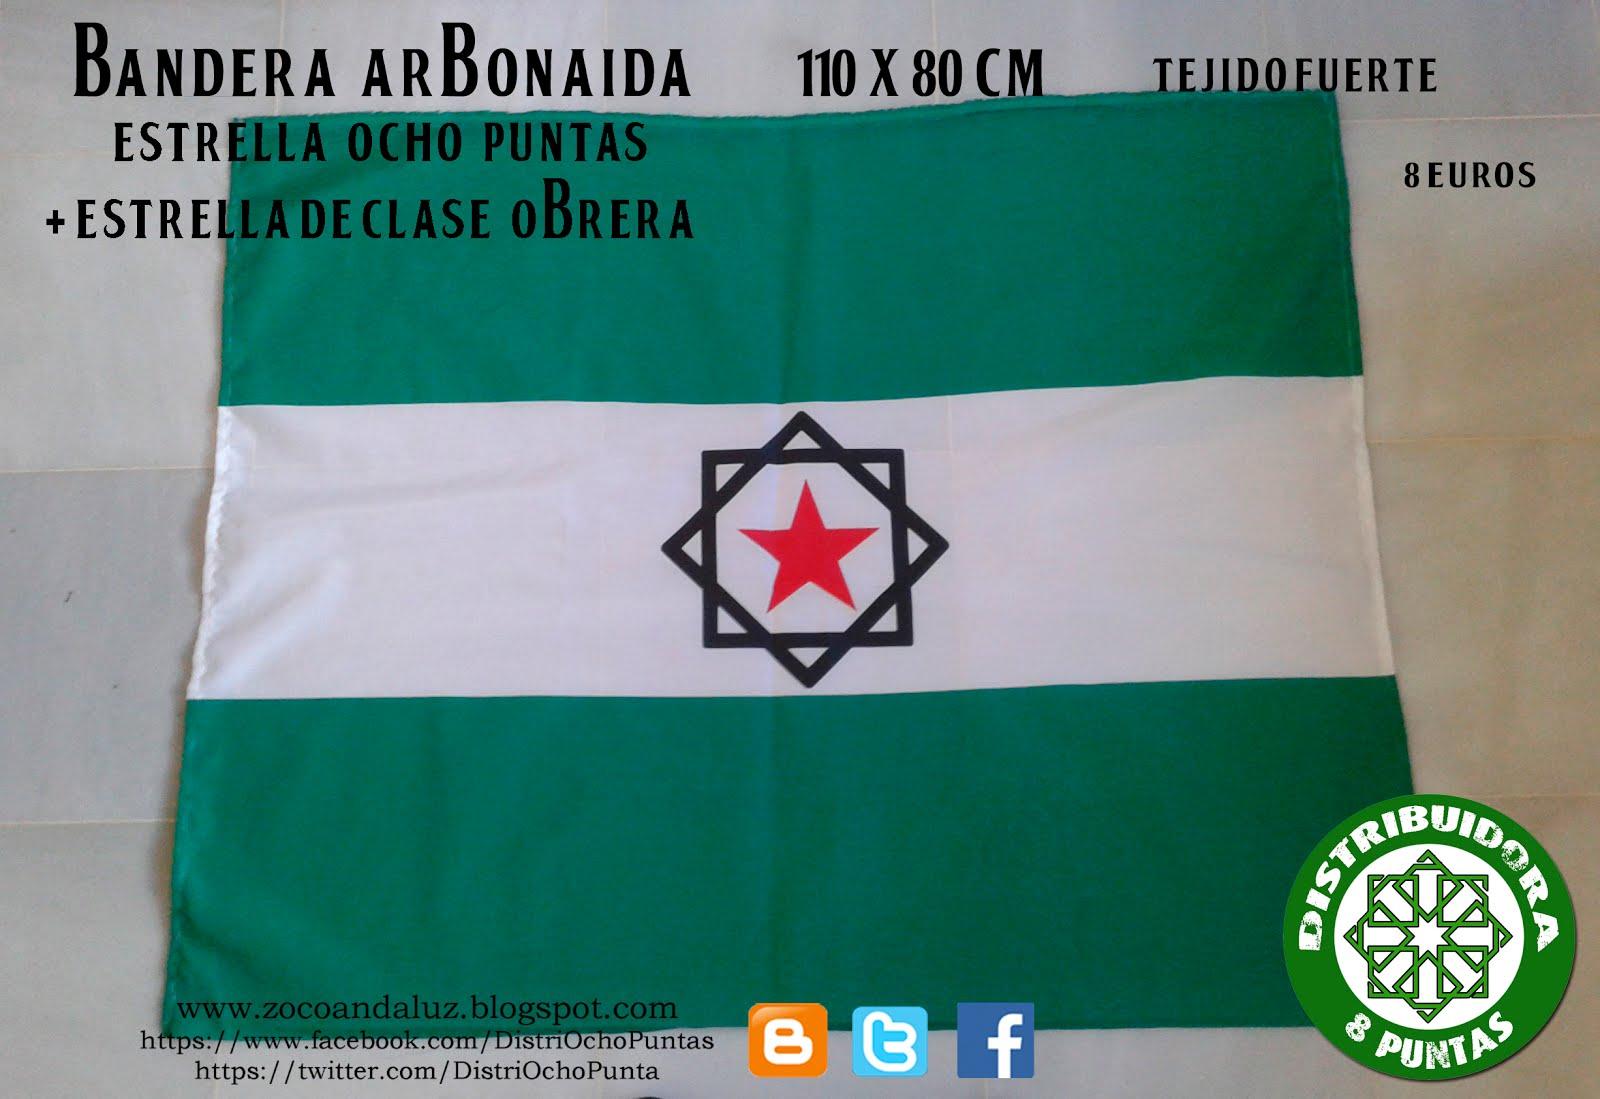 Arbonaida Gadeiro + Estrella roja de clase